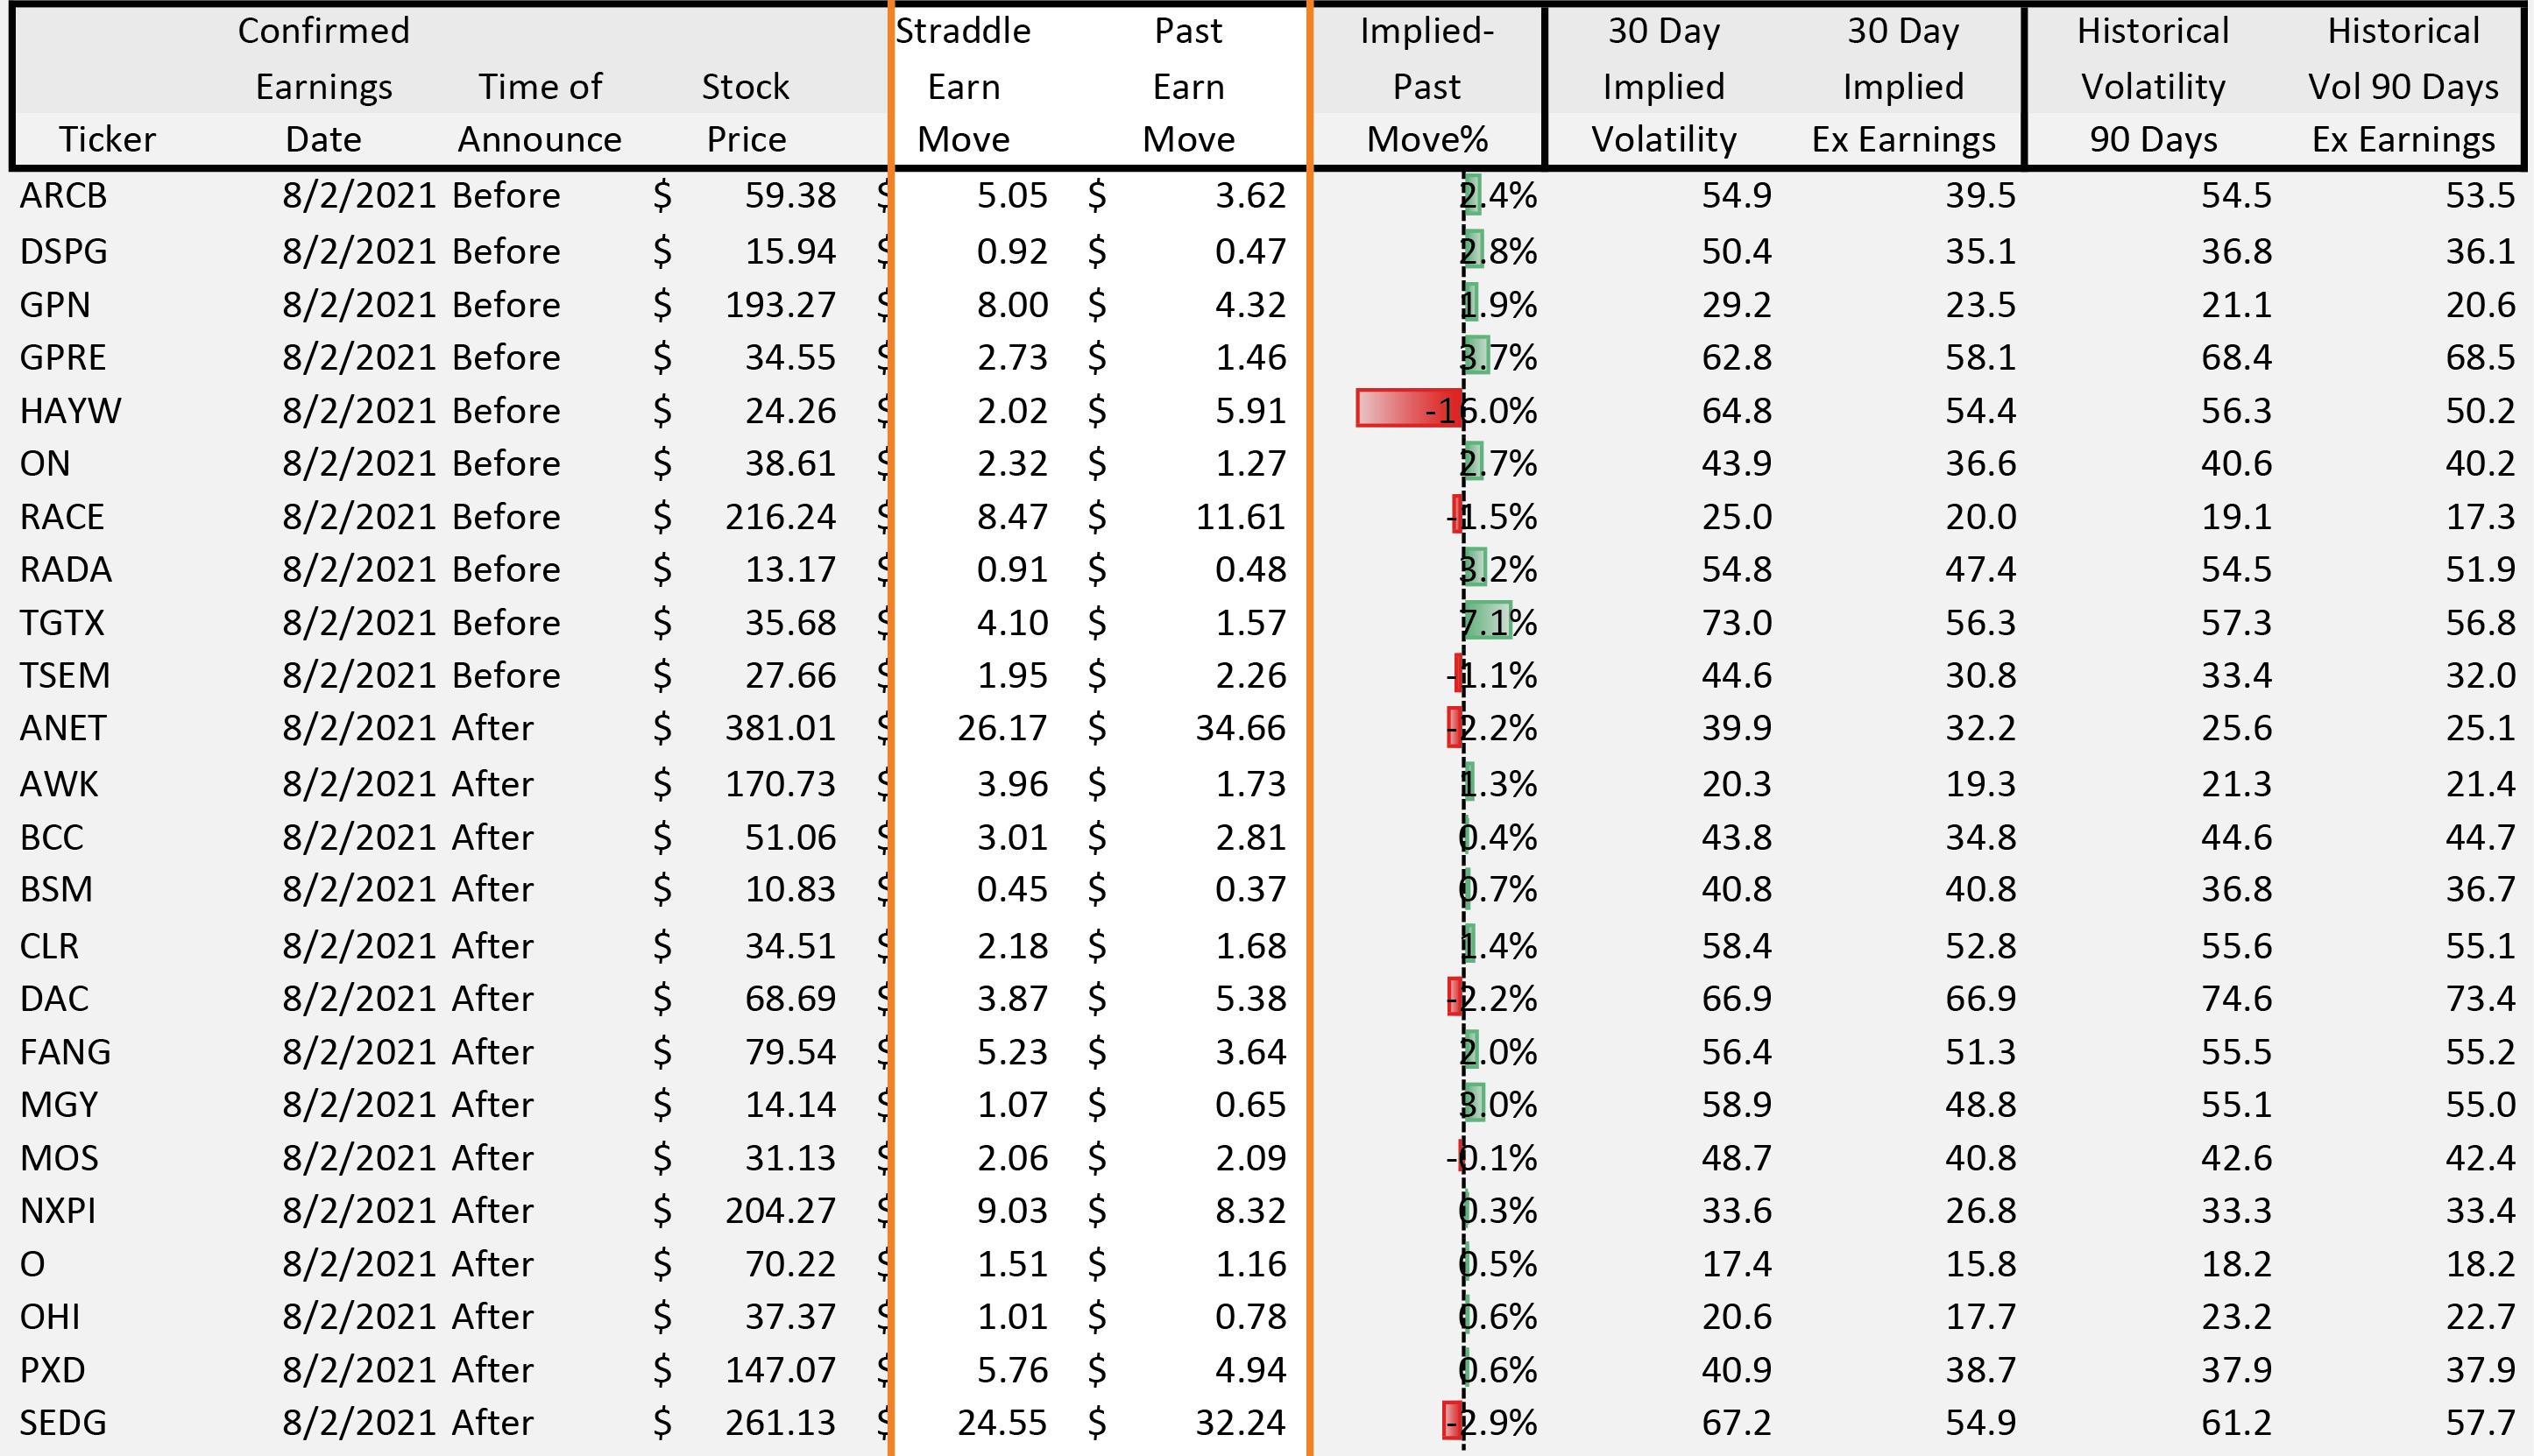 Earn Move Report Columns